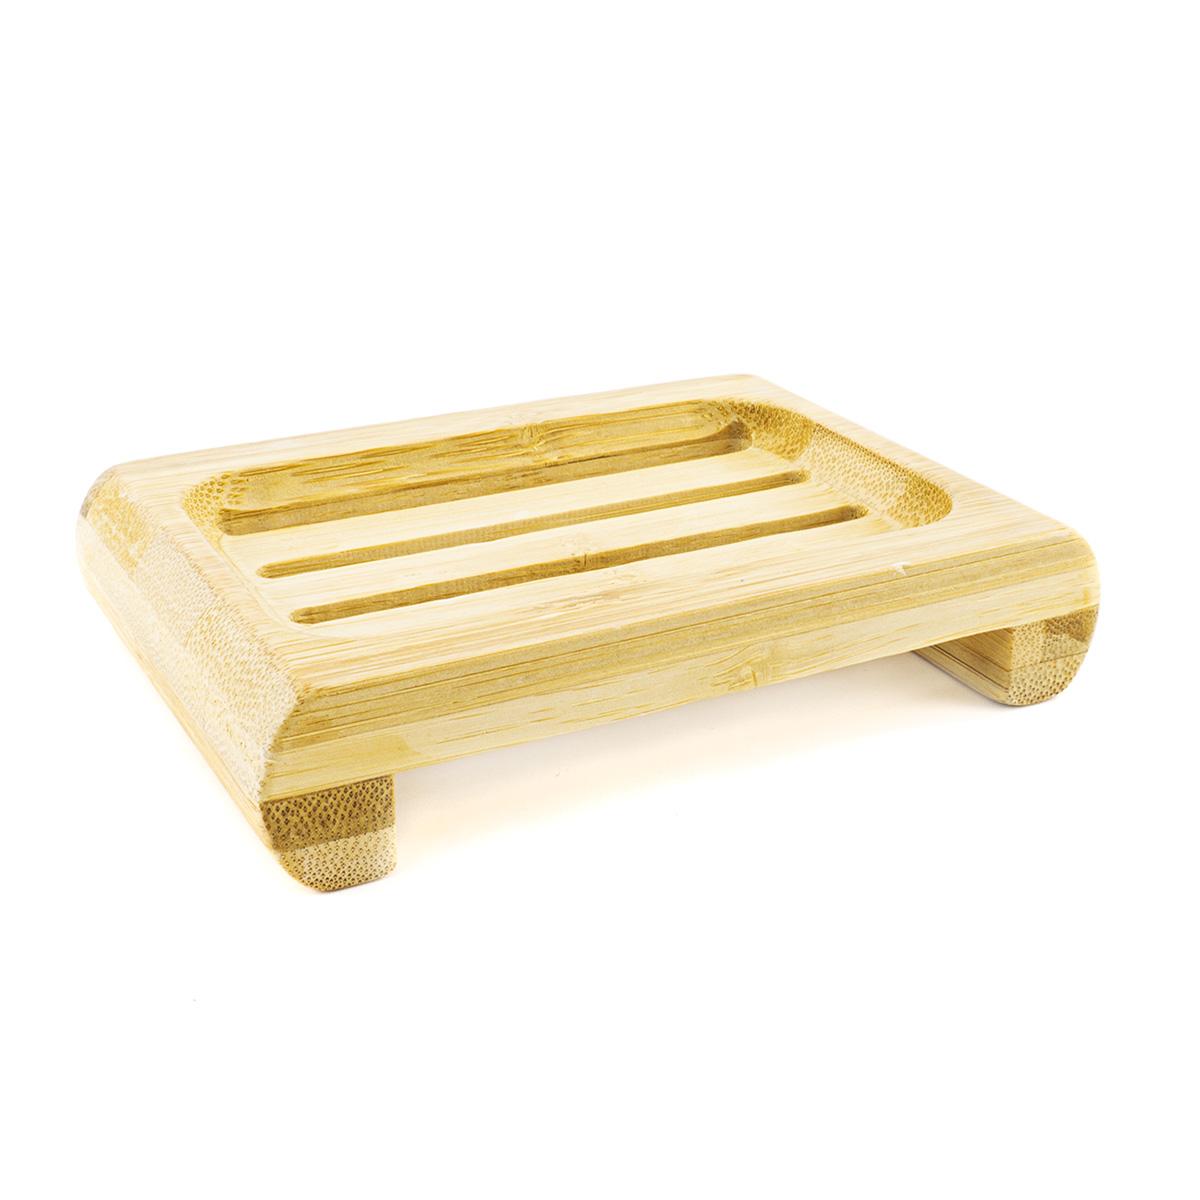 Jabonera de bambu biodegradable